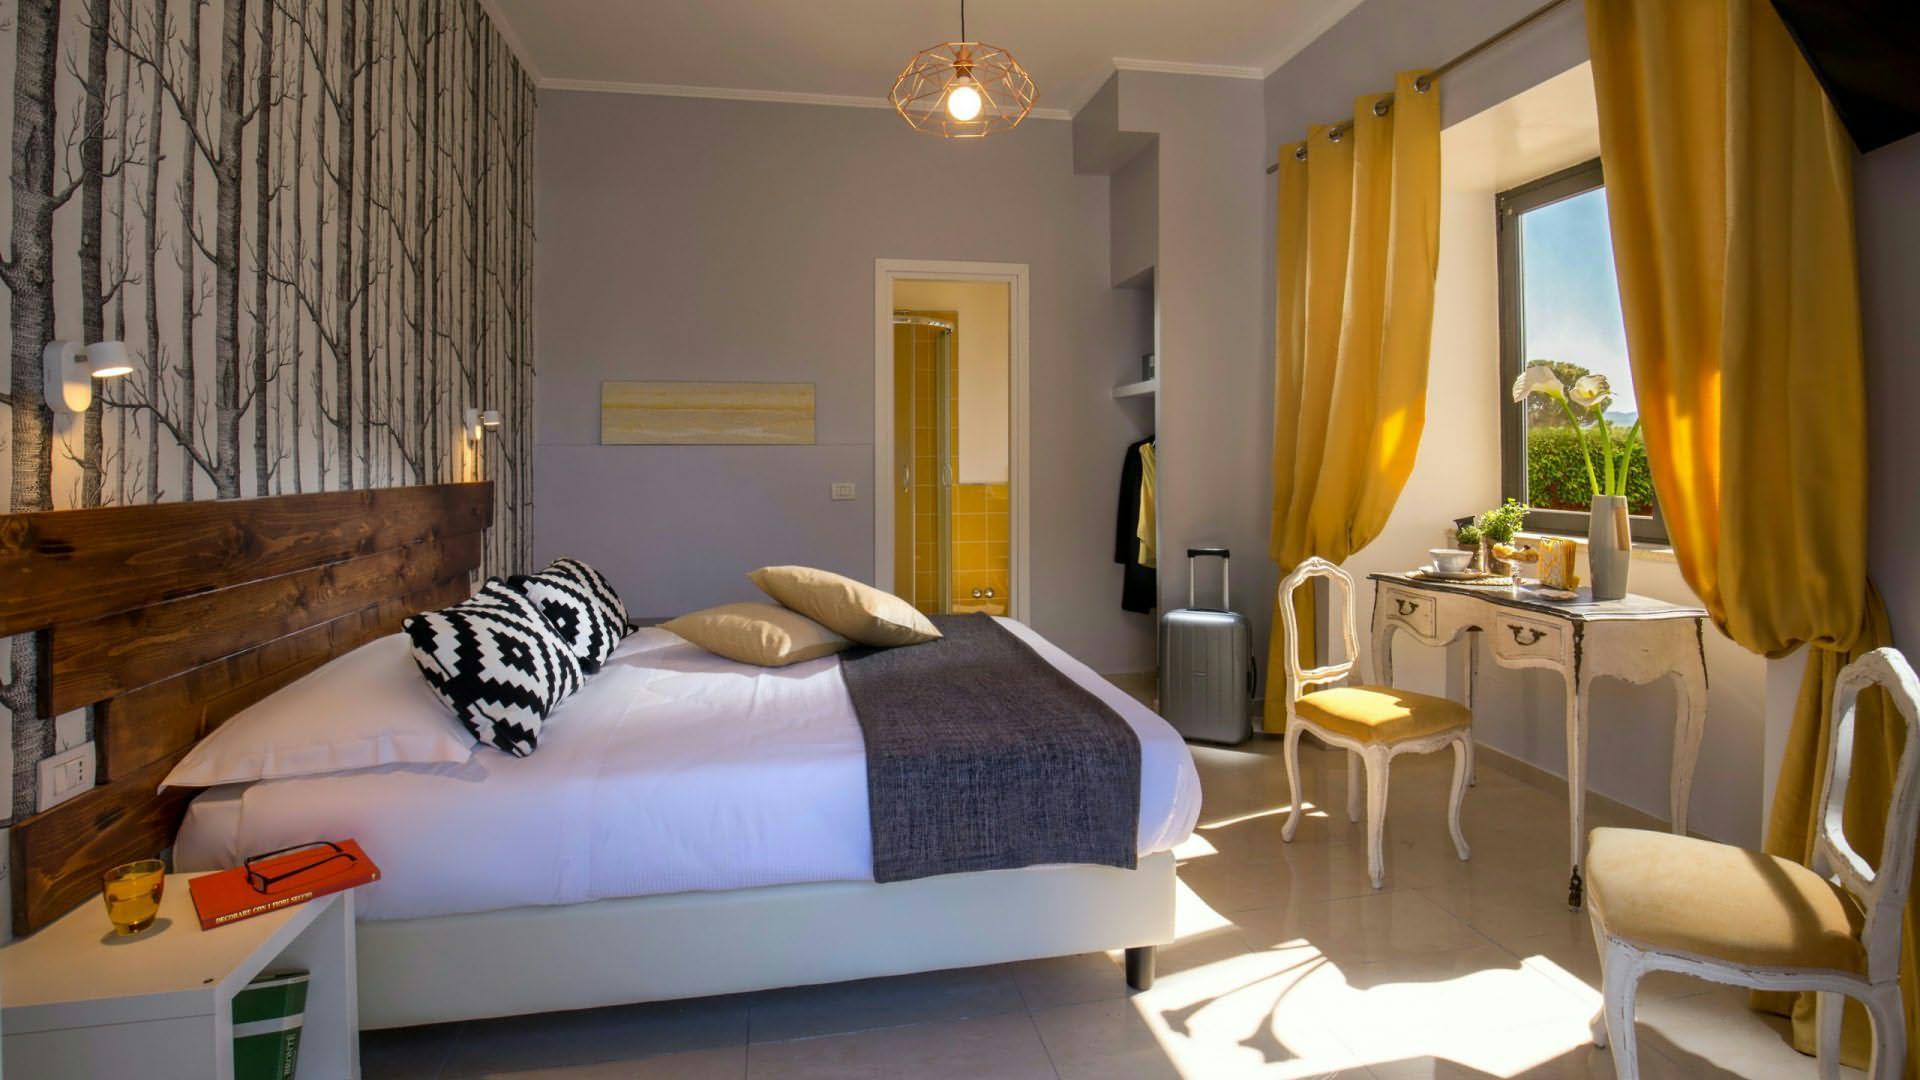 urbangarden-hotel-roma-camere-02